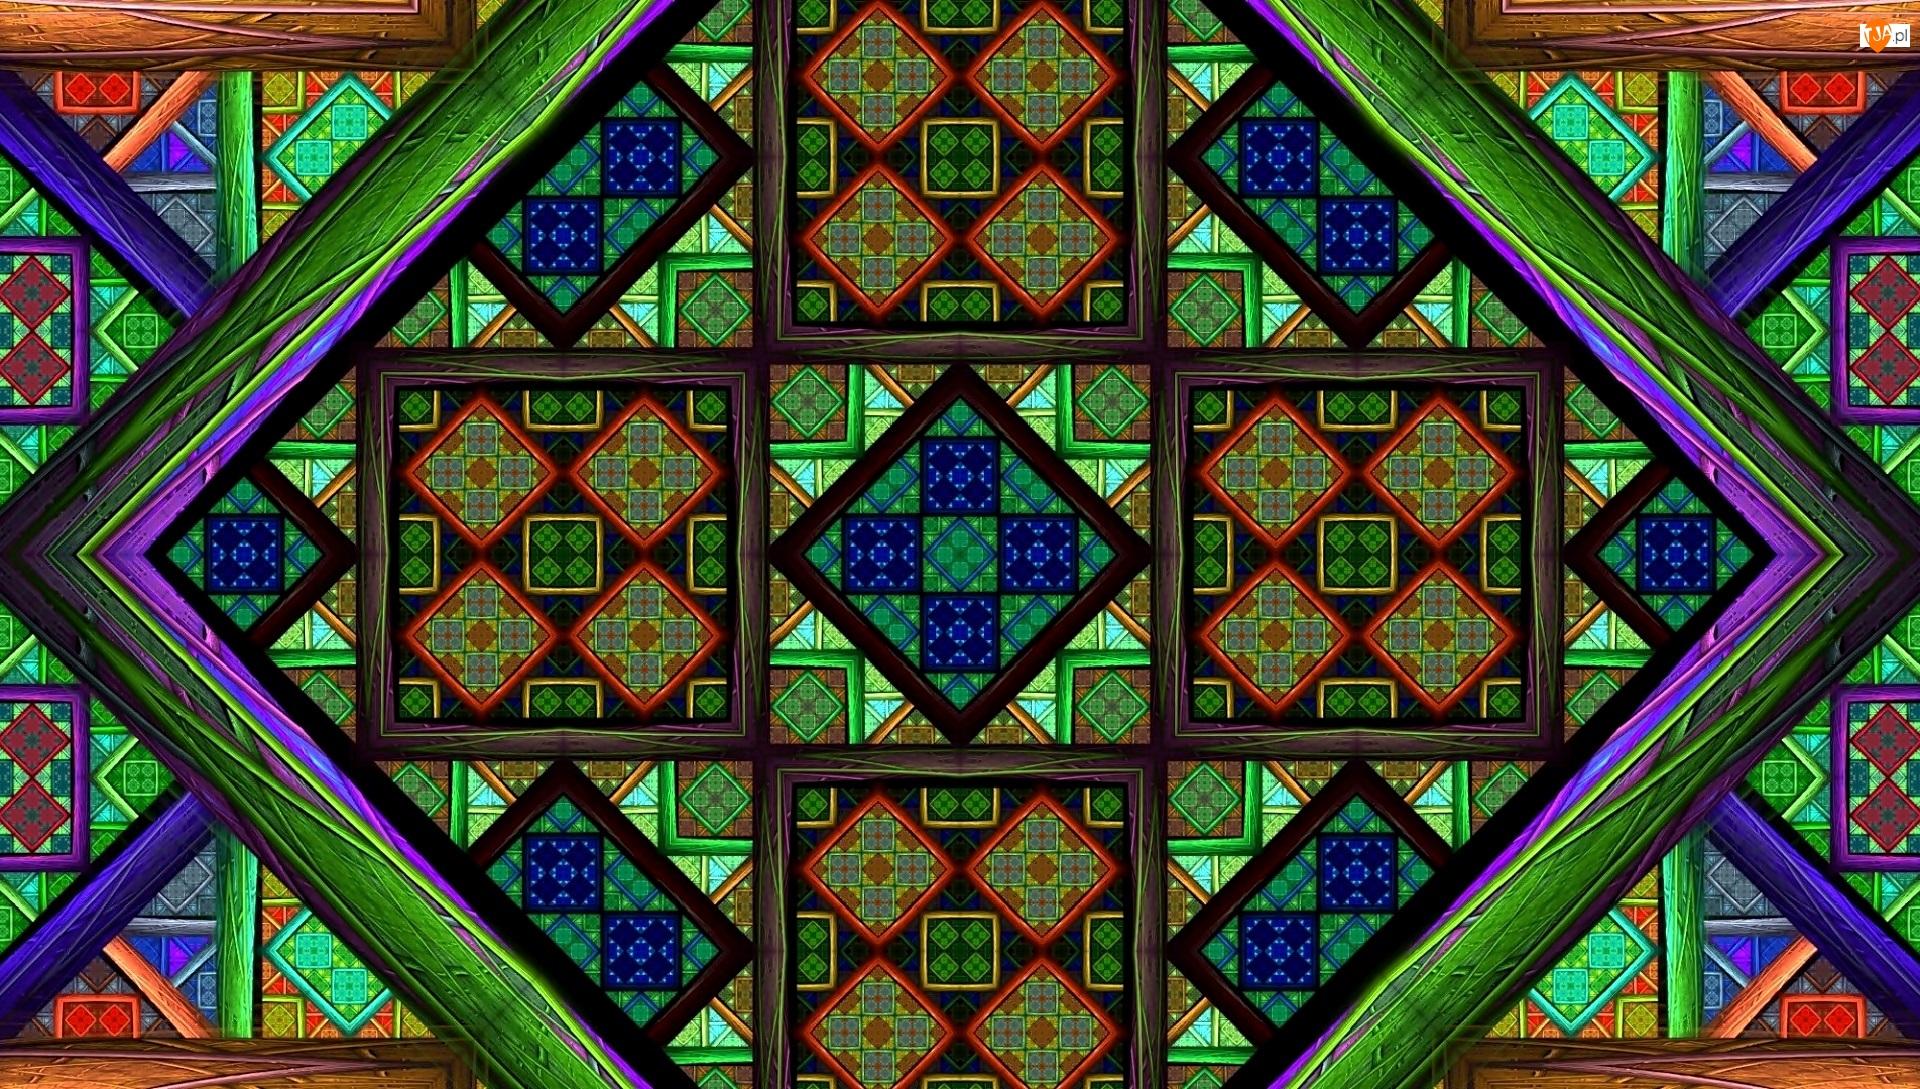 Tekstura, Kolorowe, Kwadraty, Mozaika